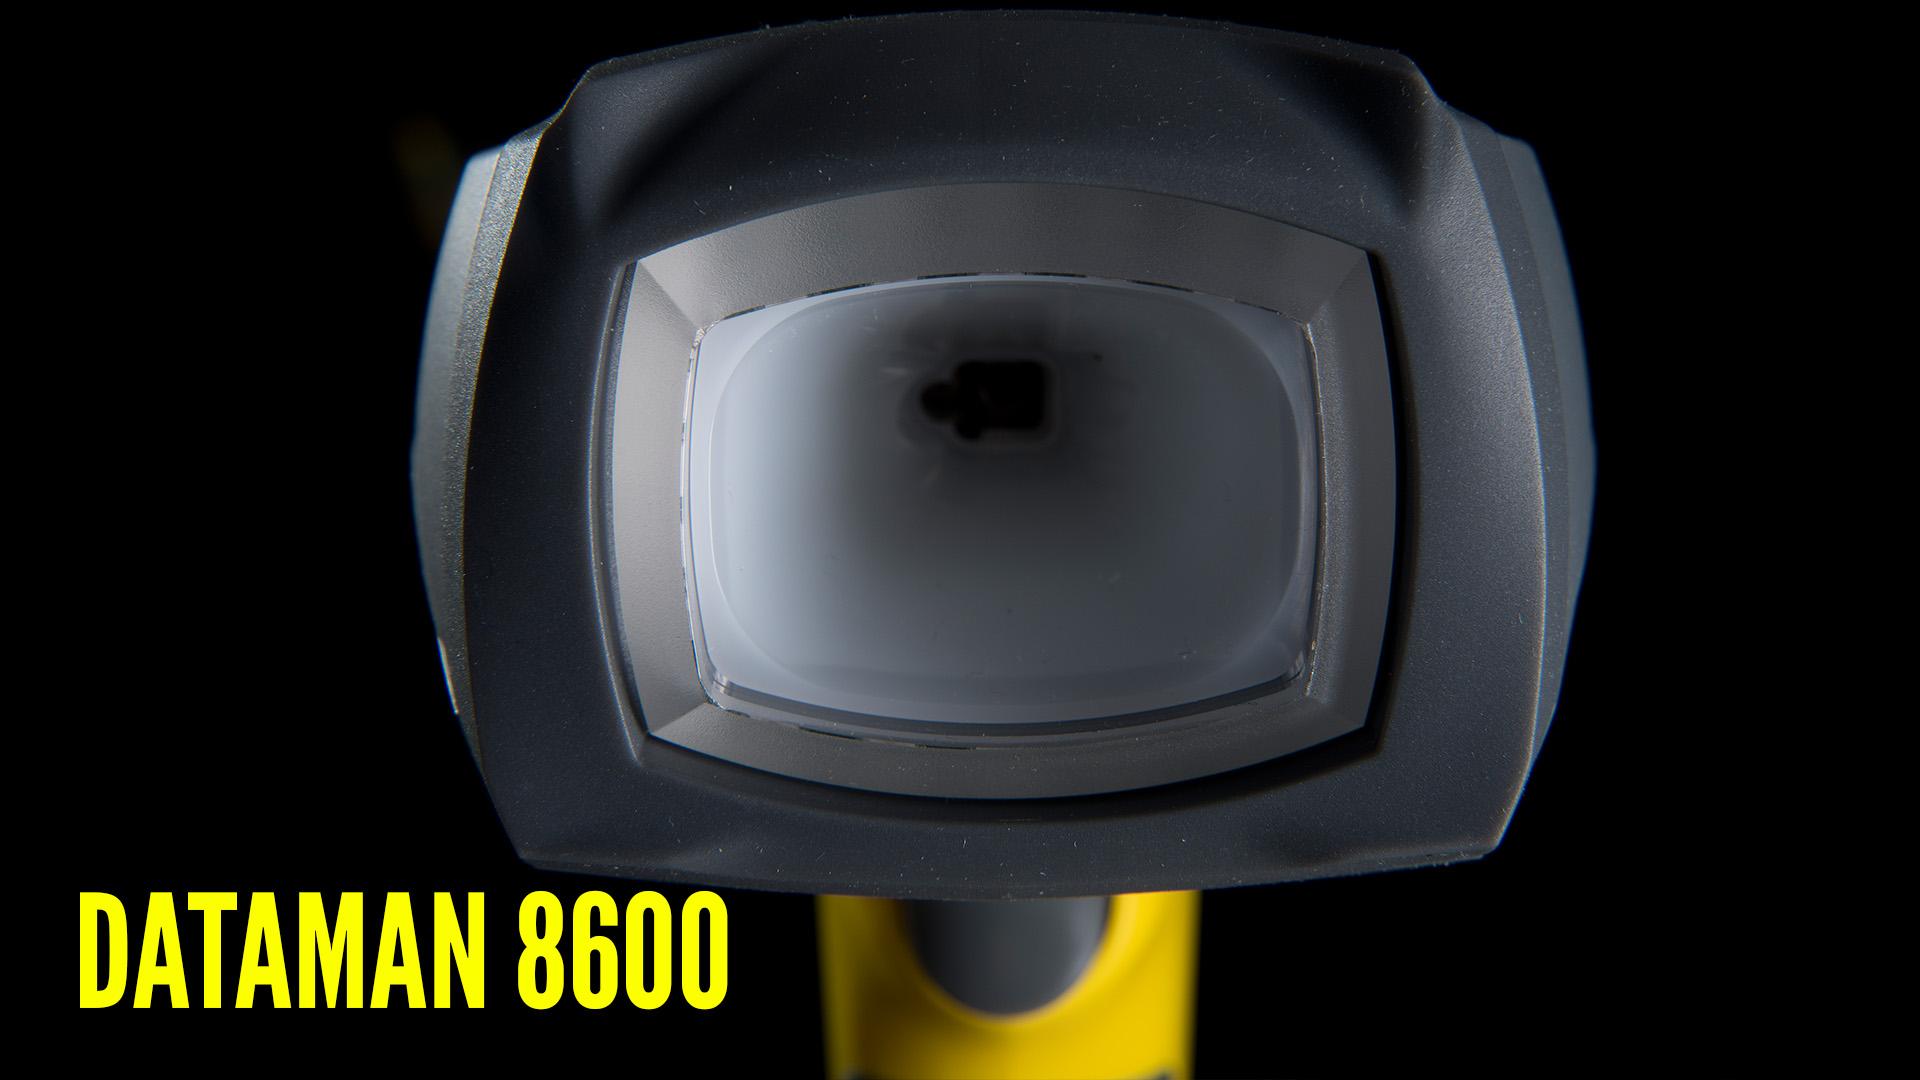 DataMan 8600 Overview